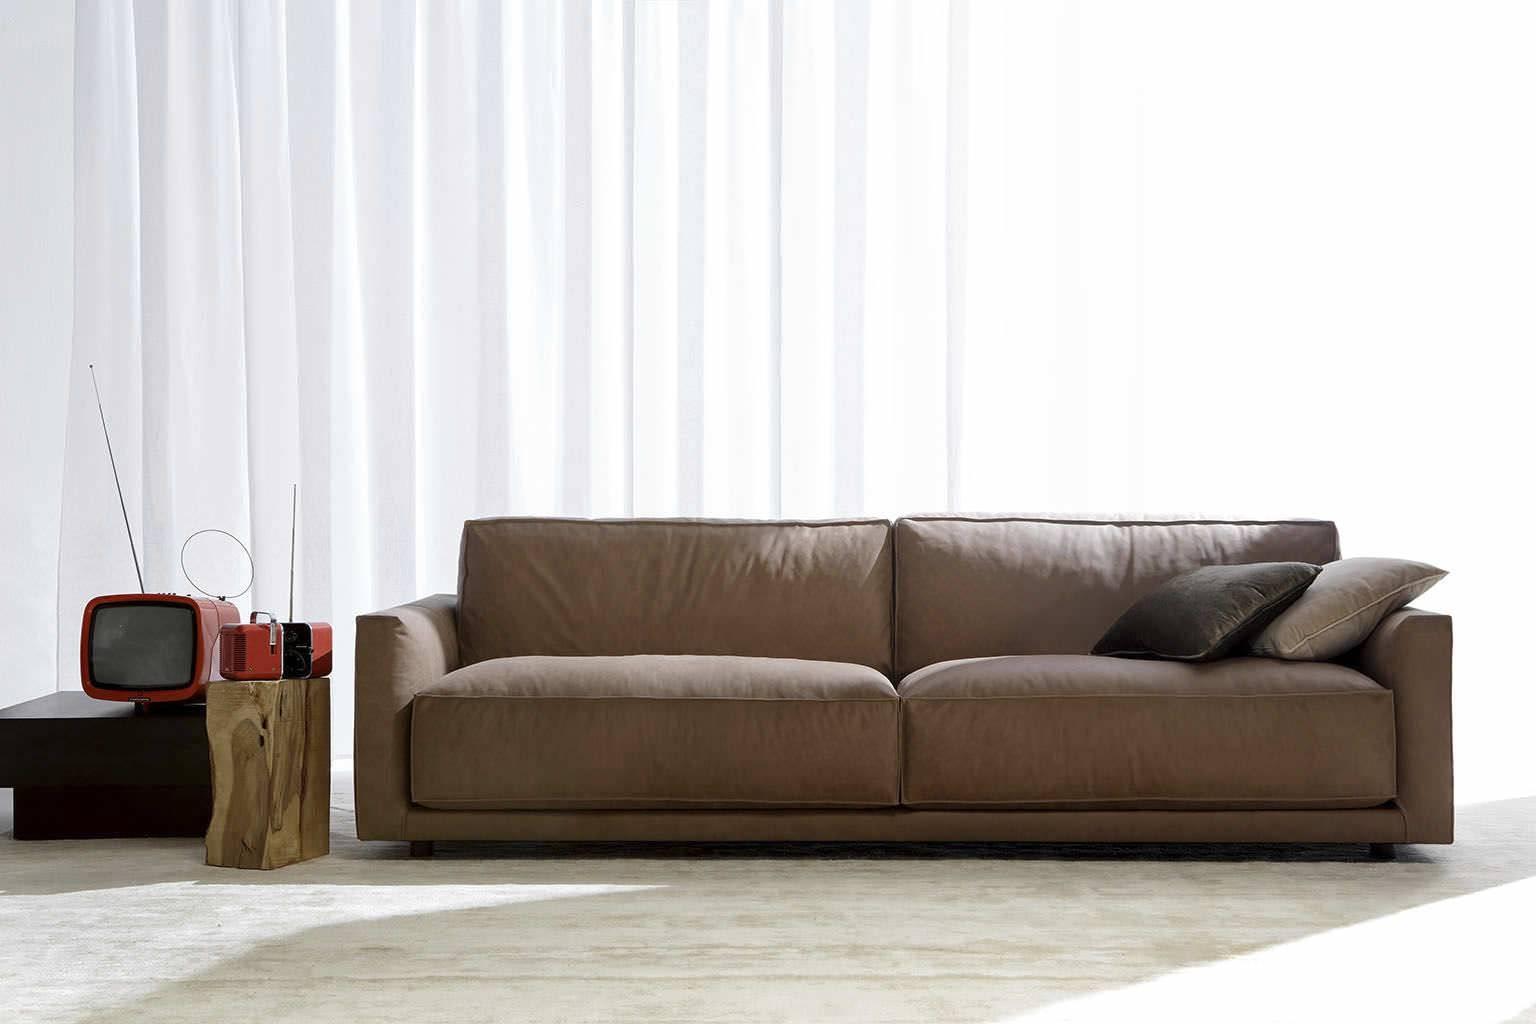 Sofa Design Ideas (View 15 of 15)